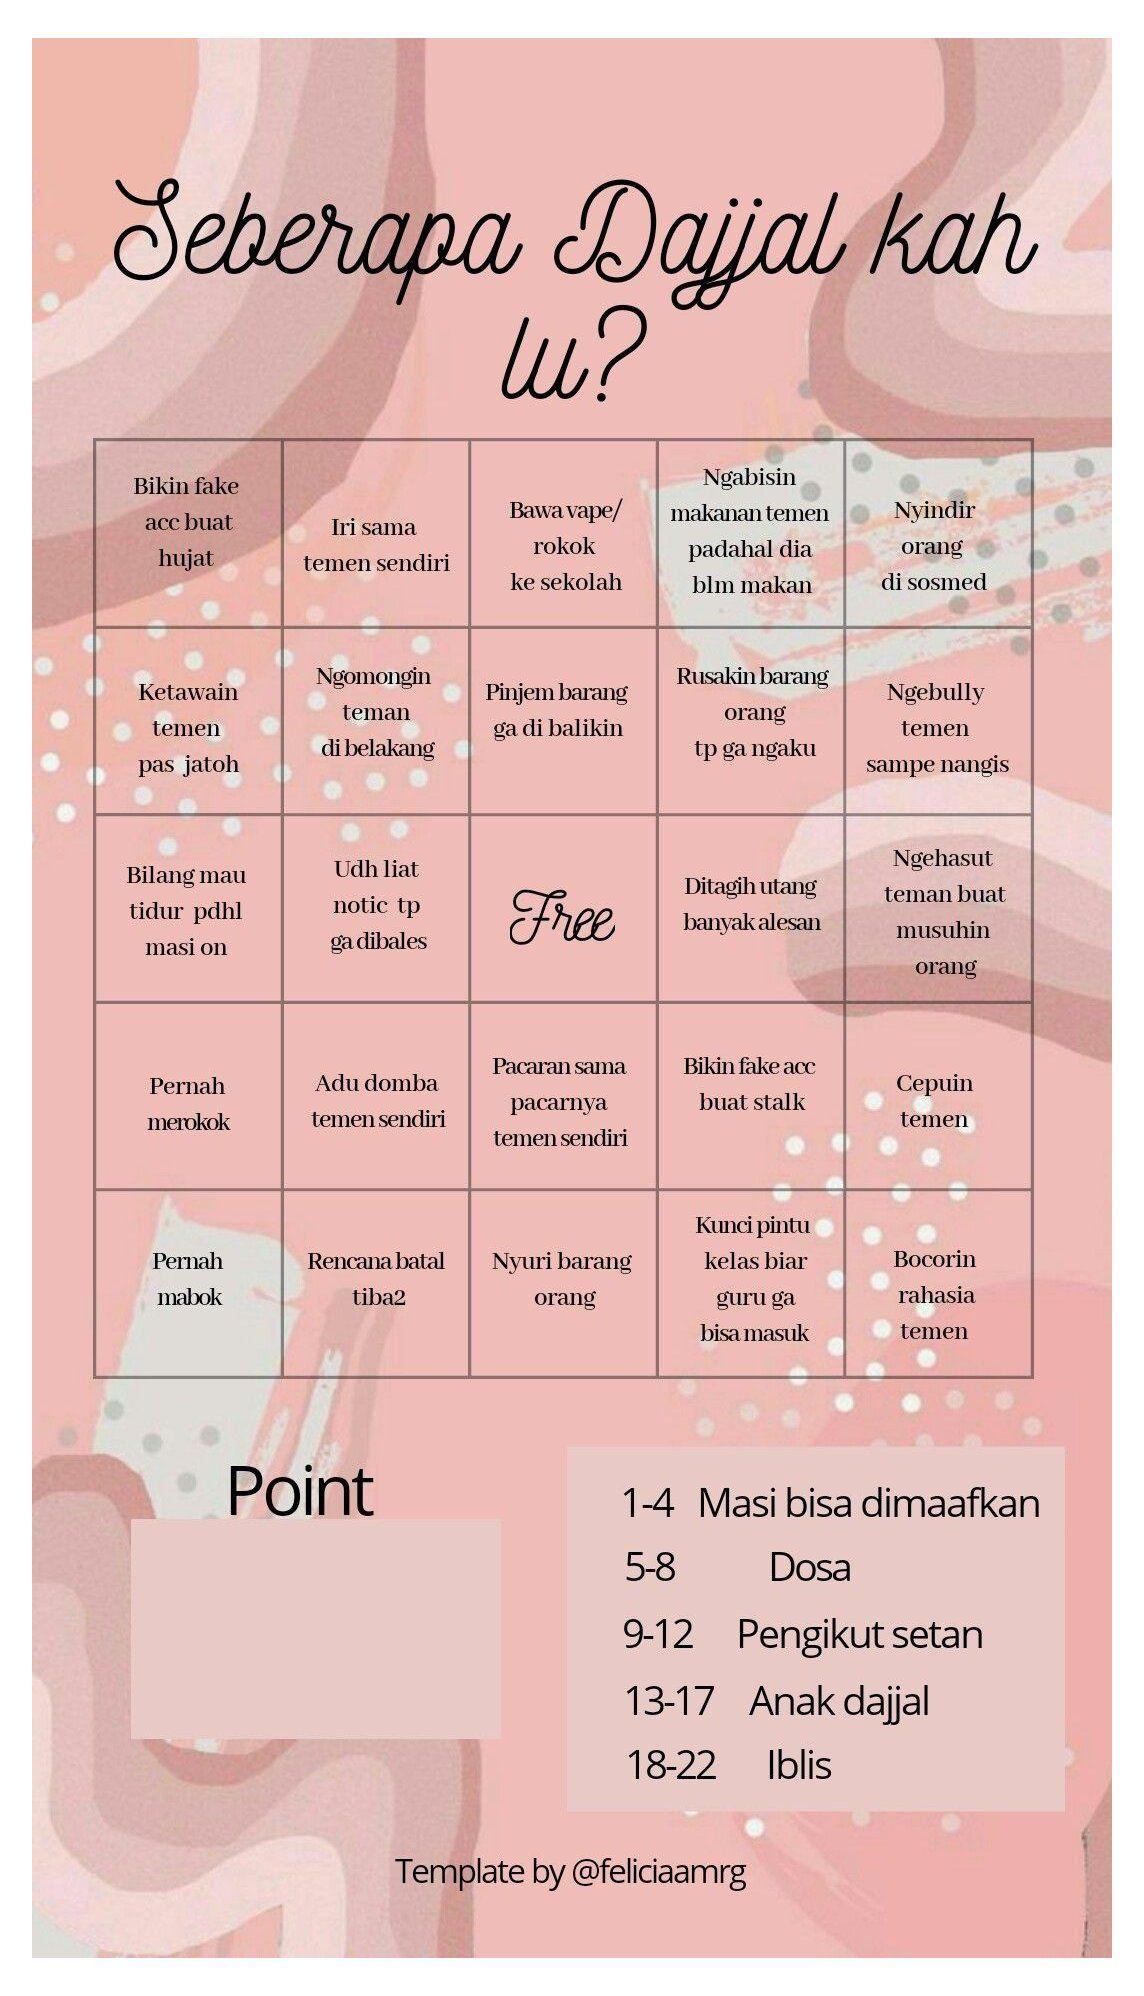 Template Bingo Indonesia Templates Instagram Stories Question Indonesia Sekolah In 2020 Reminder Quotes Bingo Template Instagram Story Questions